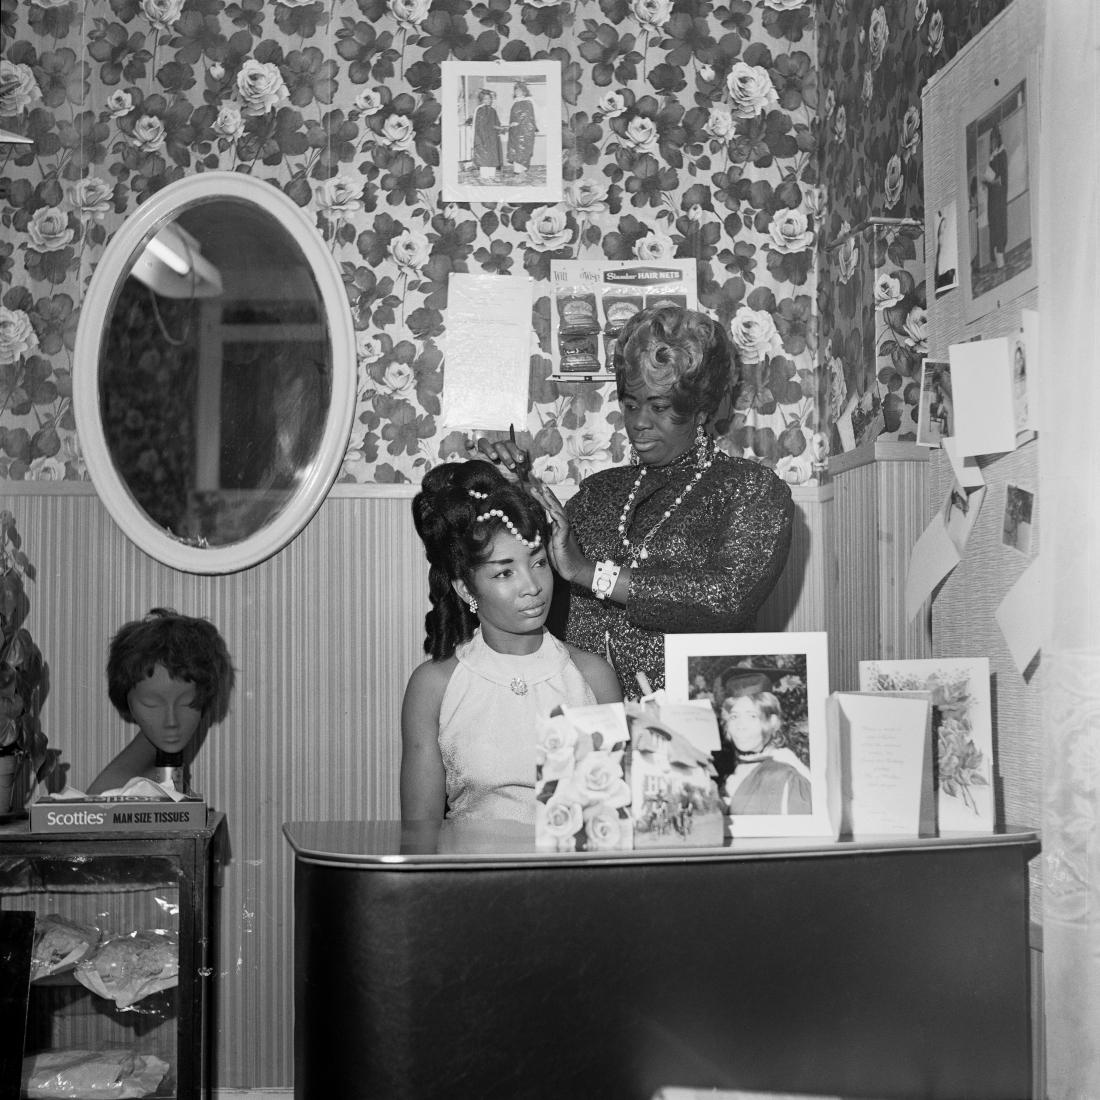 Beauty Salon, Hammersmith, London, c.1960s/70s. From the portfolio 'Black Beauty Pageants'. © Raphael Albert, courtesy Autograph ABP